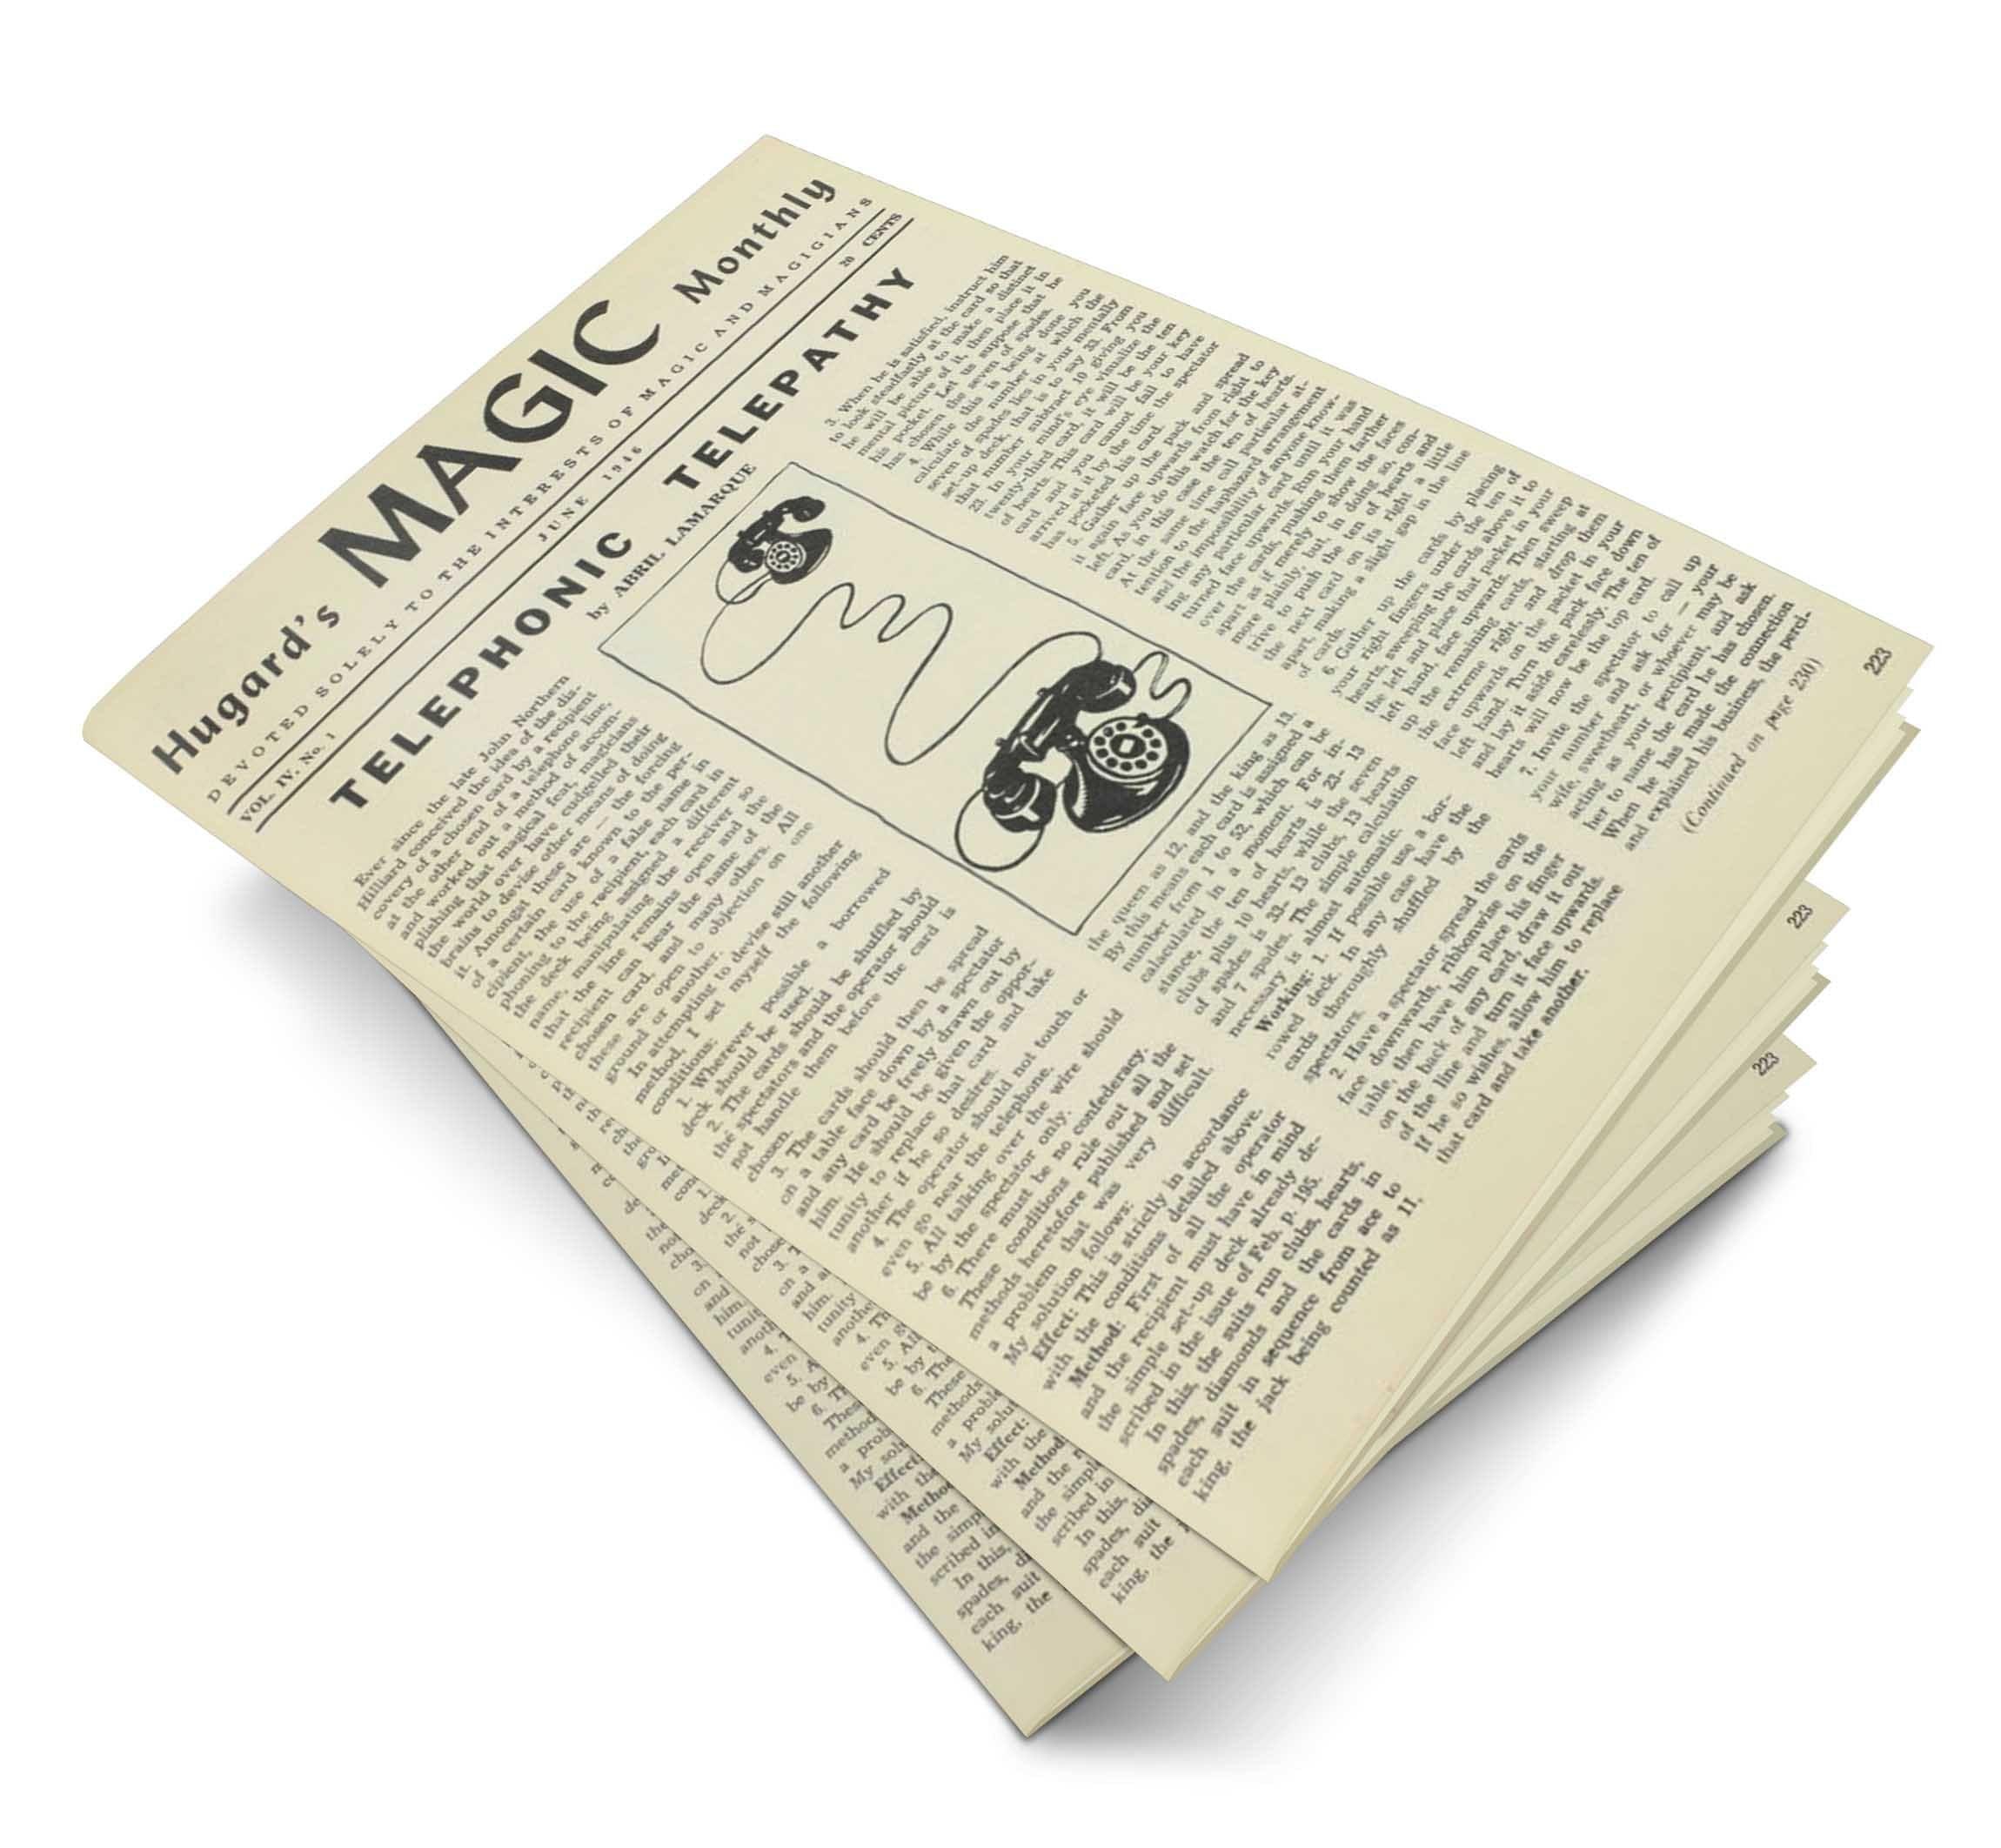 Hugard's Magic Monthly Volume 4 - magic